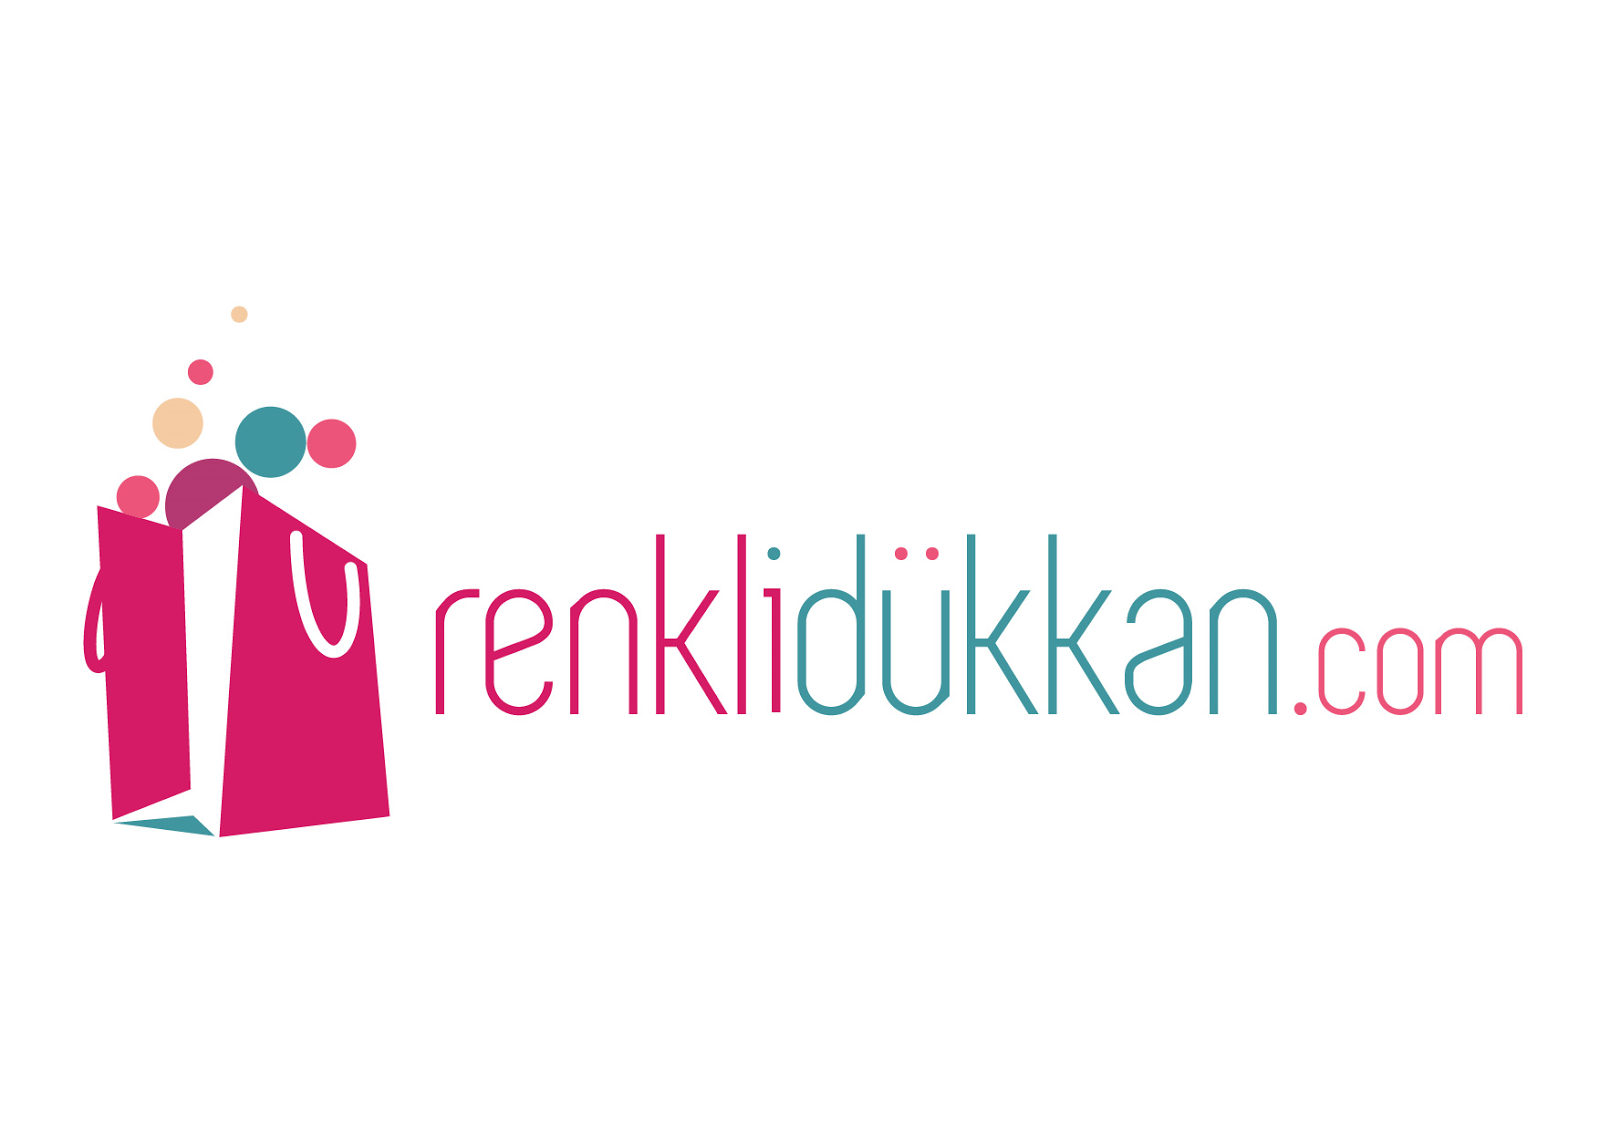 renklidukkan.com